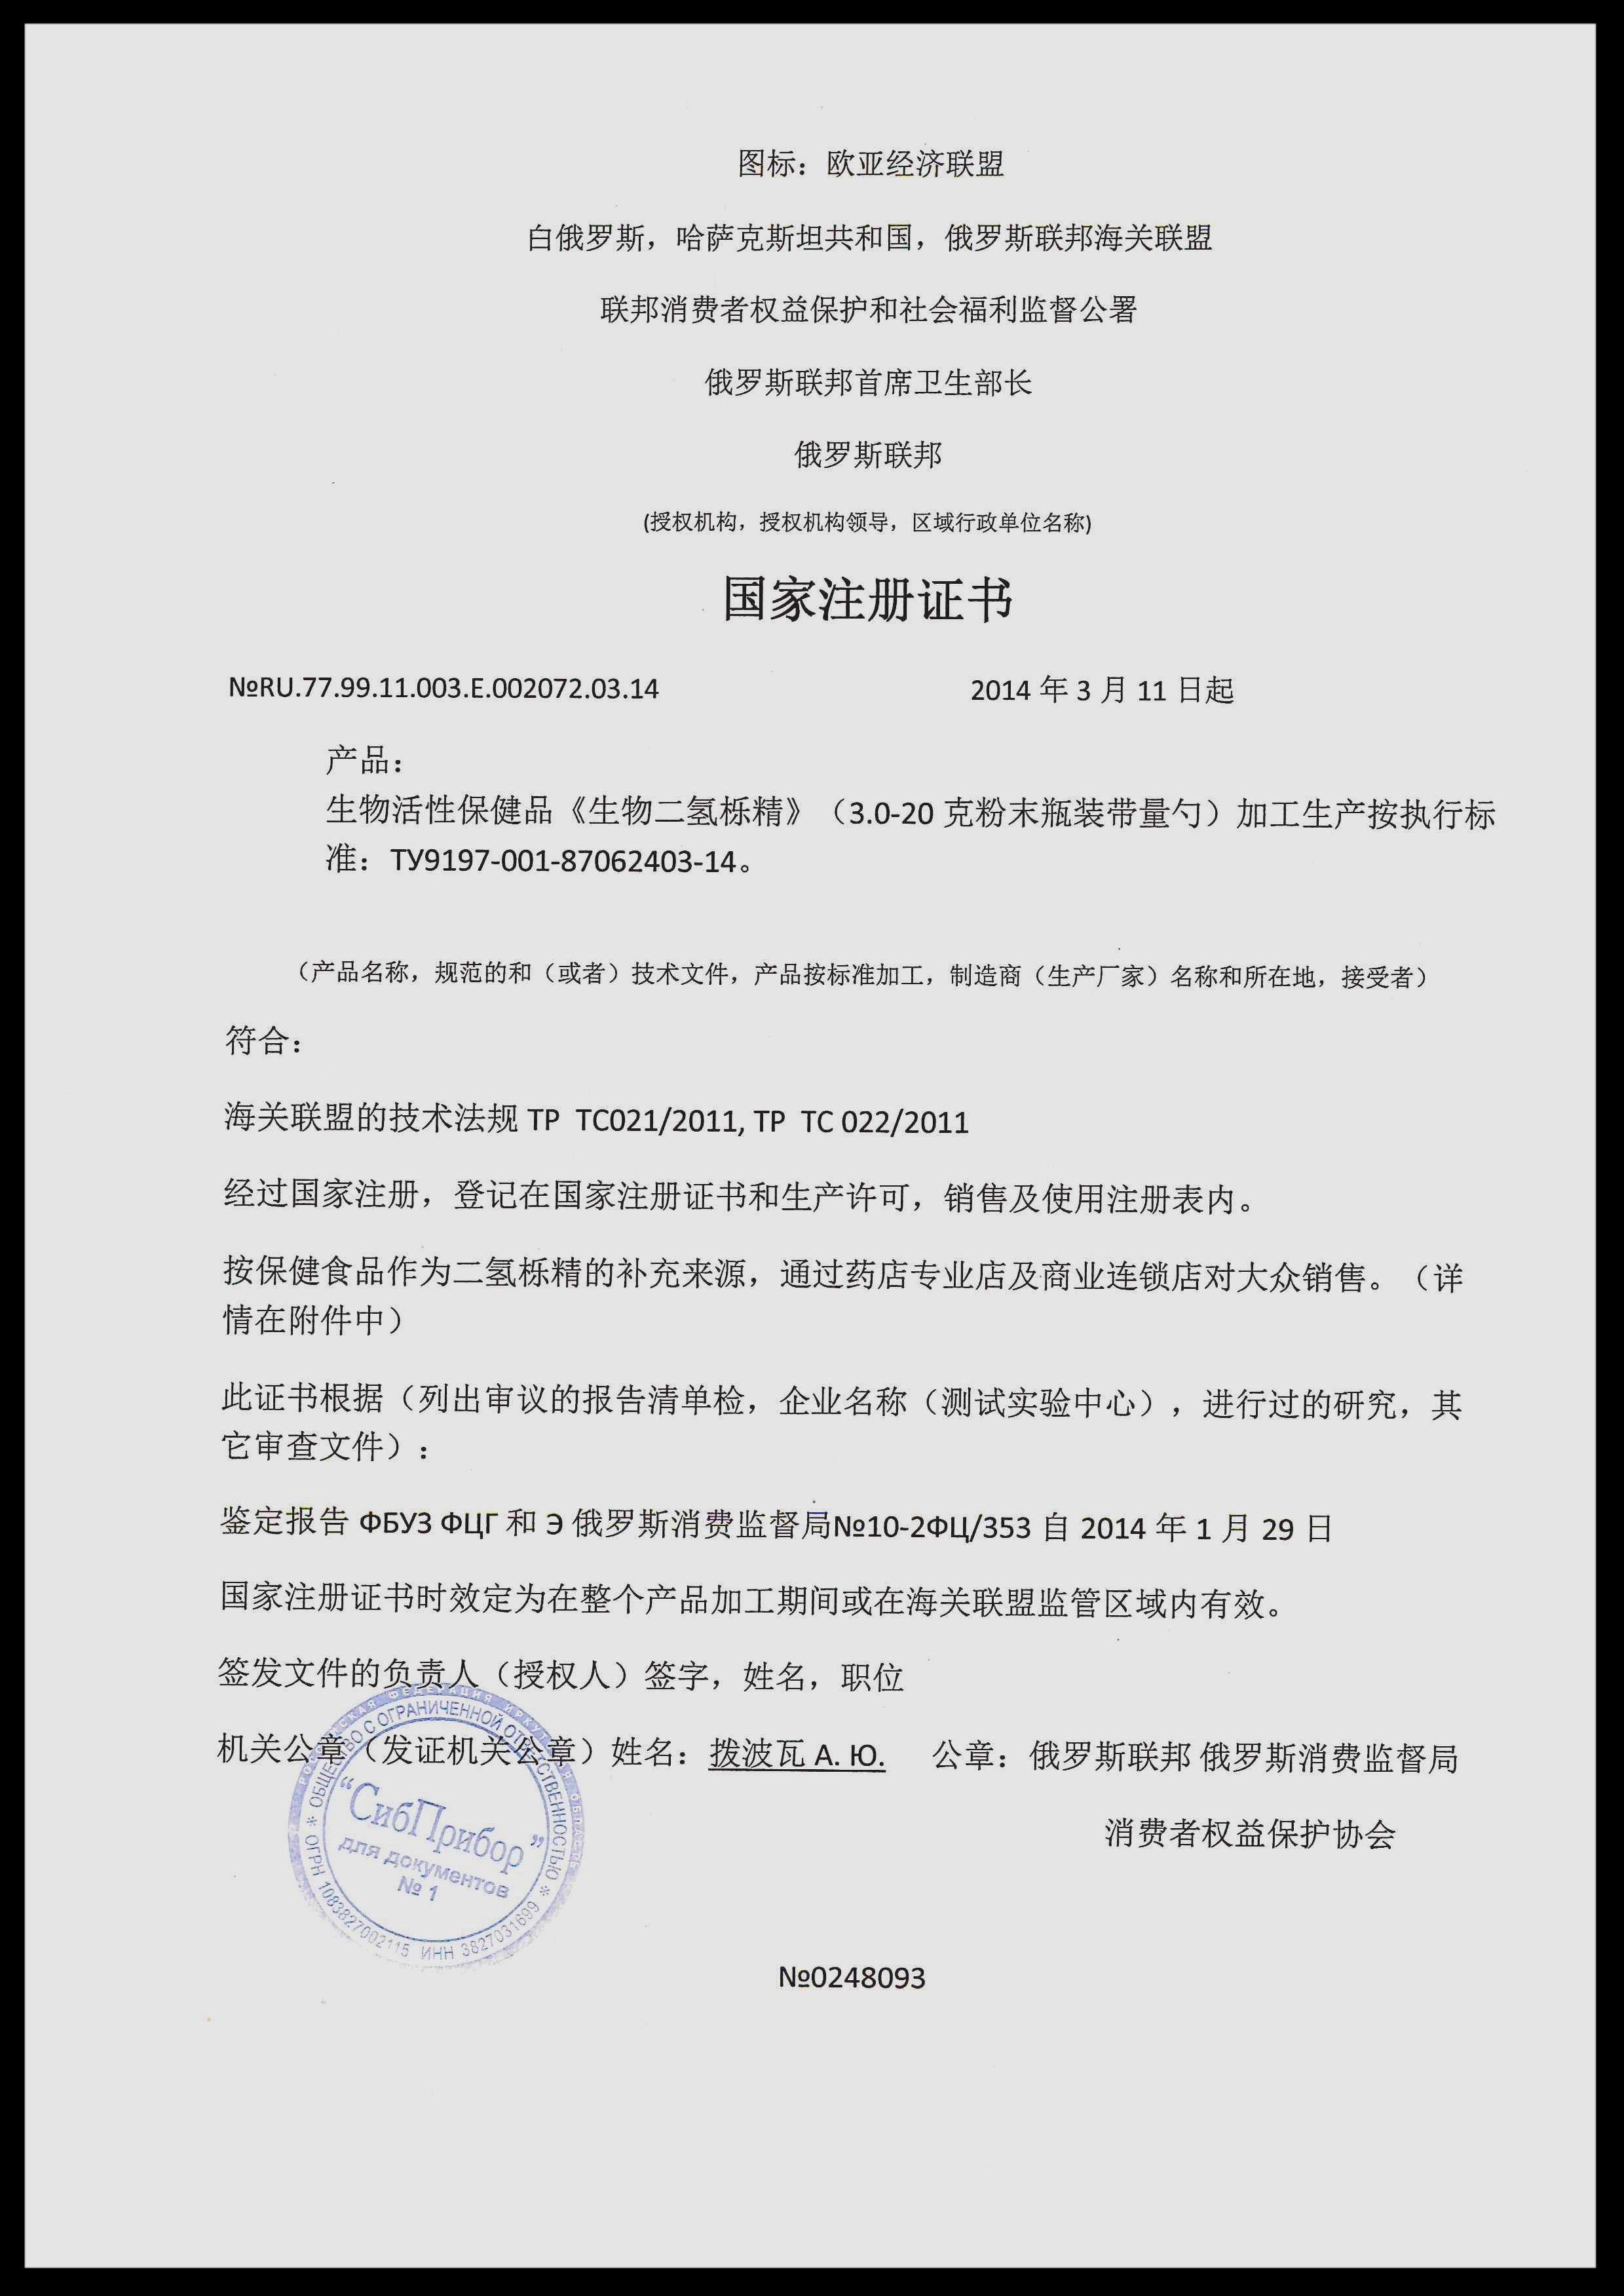 cert_taxif_china-2.jpg